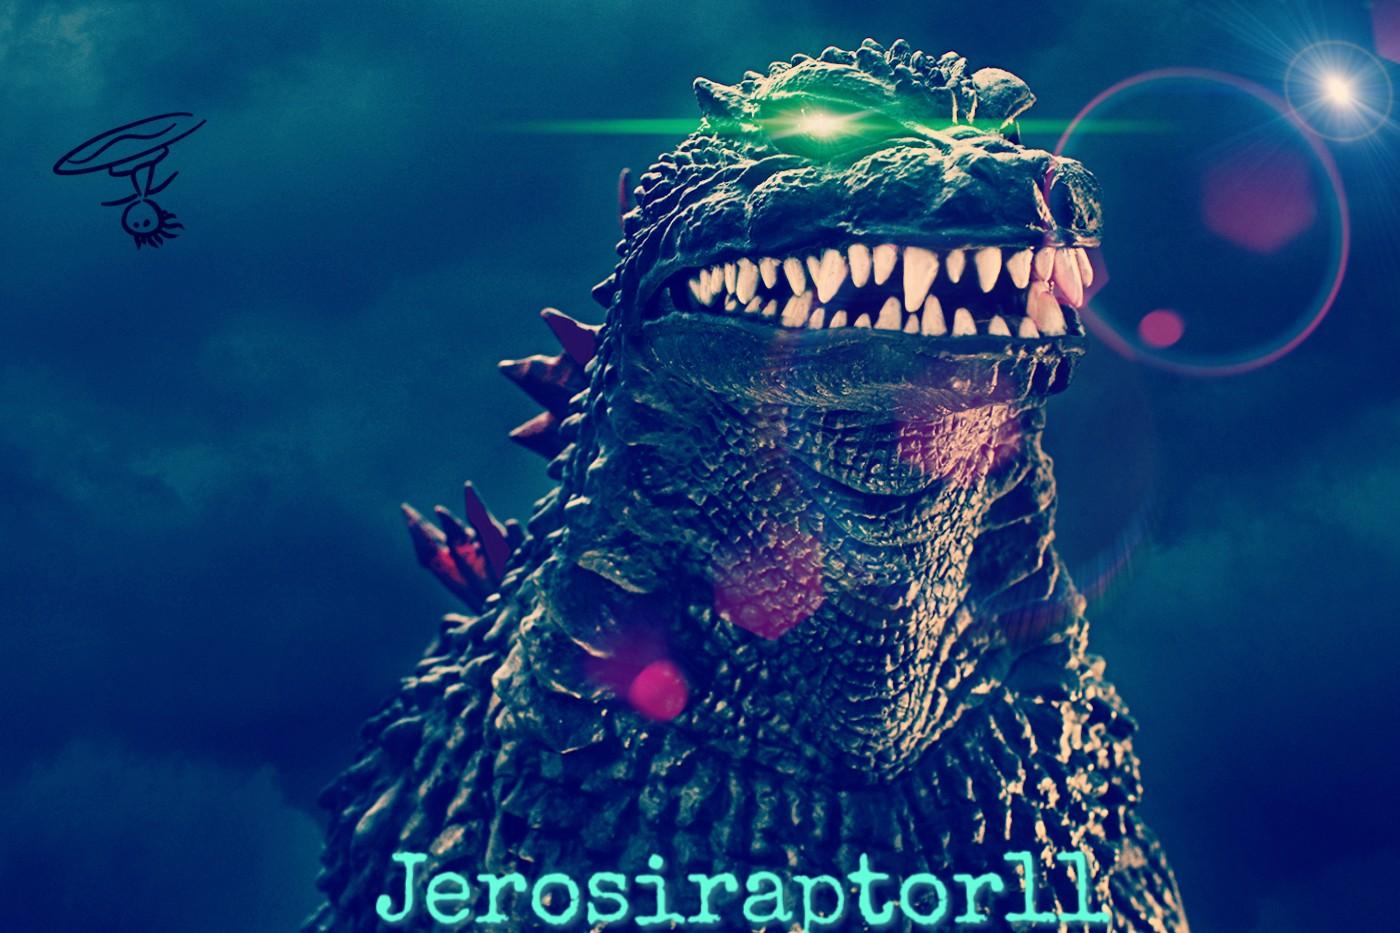 Aqui el C ñor Jerosiraptor11 :O